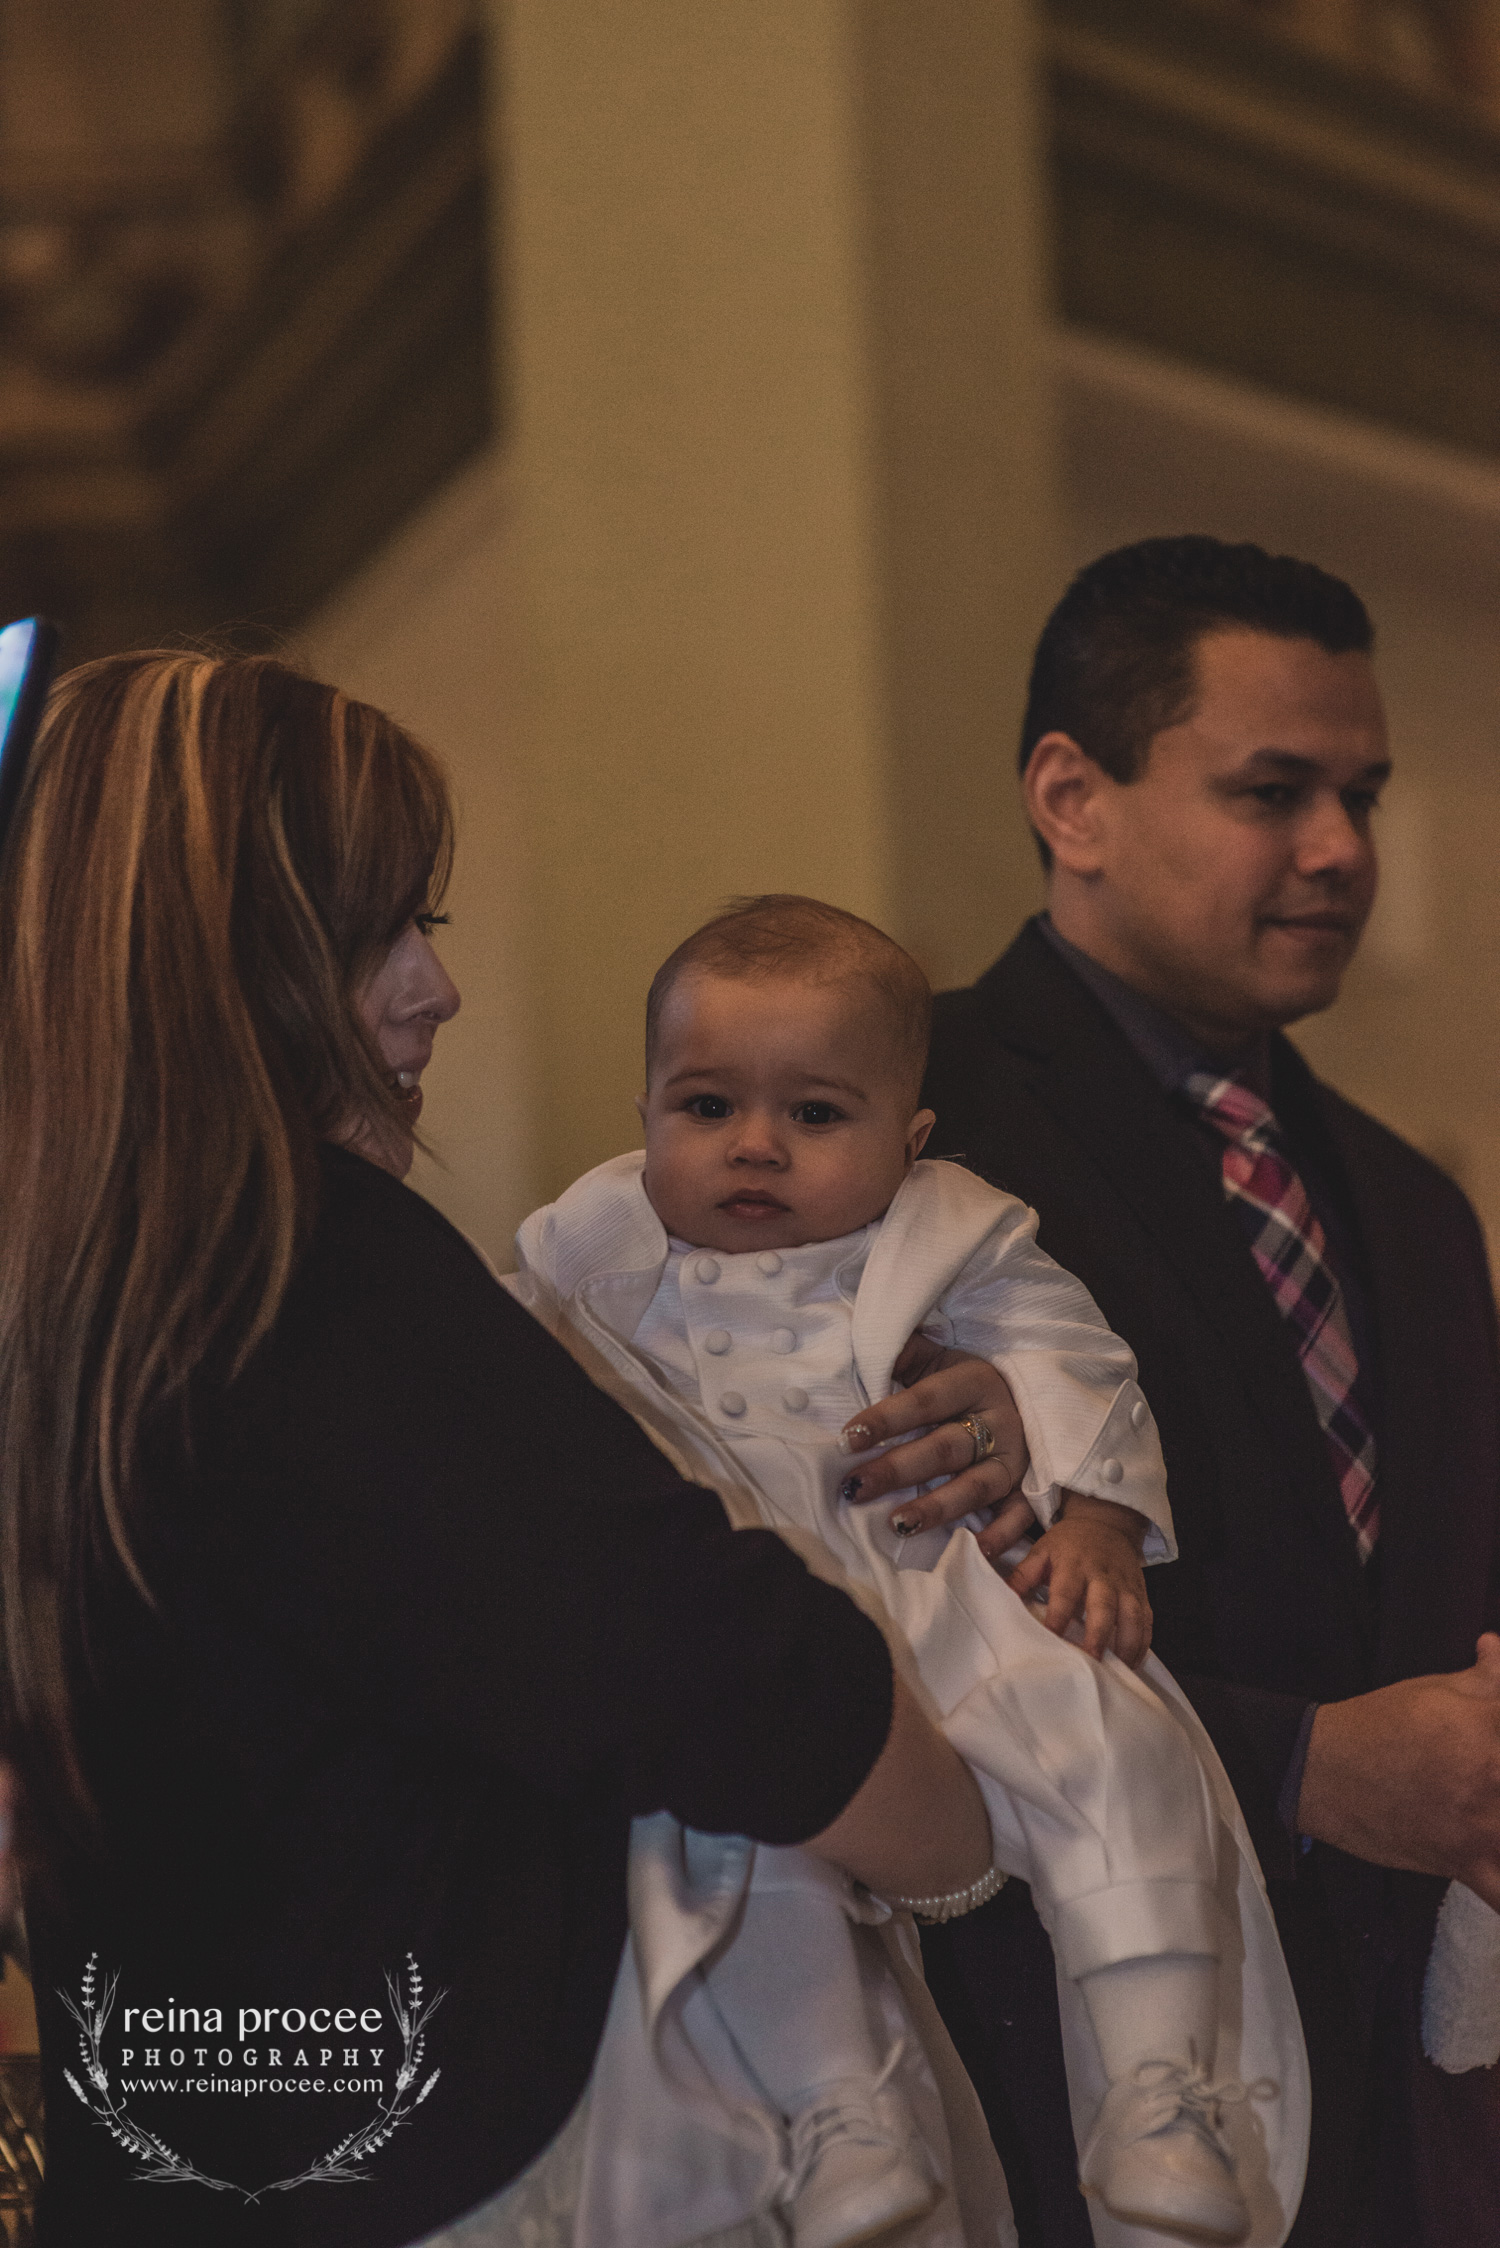 045-baptism-photographer-montreal-family-best-photos-portraits.jpg